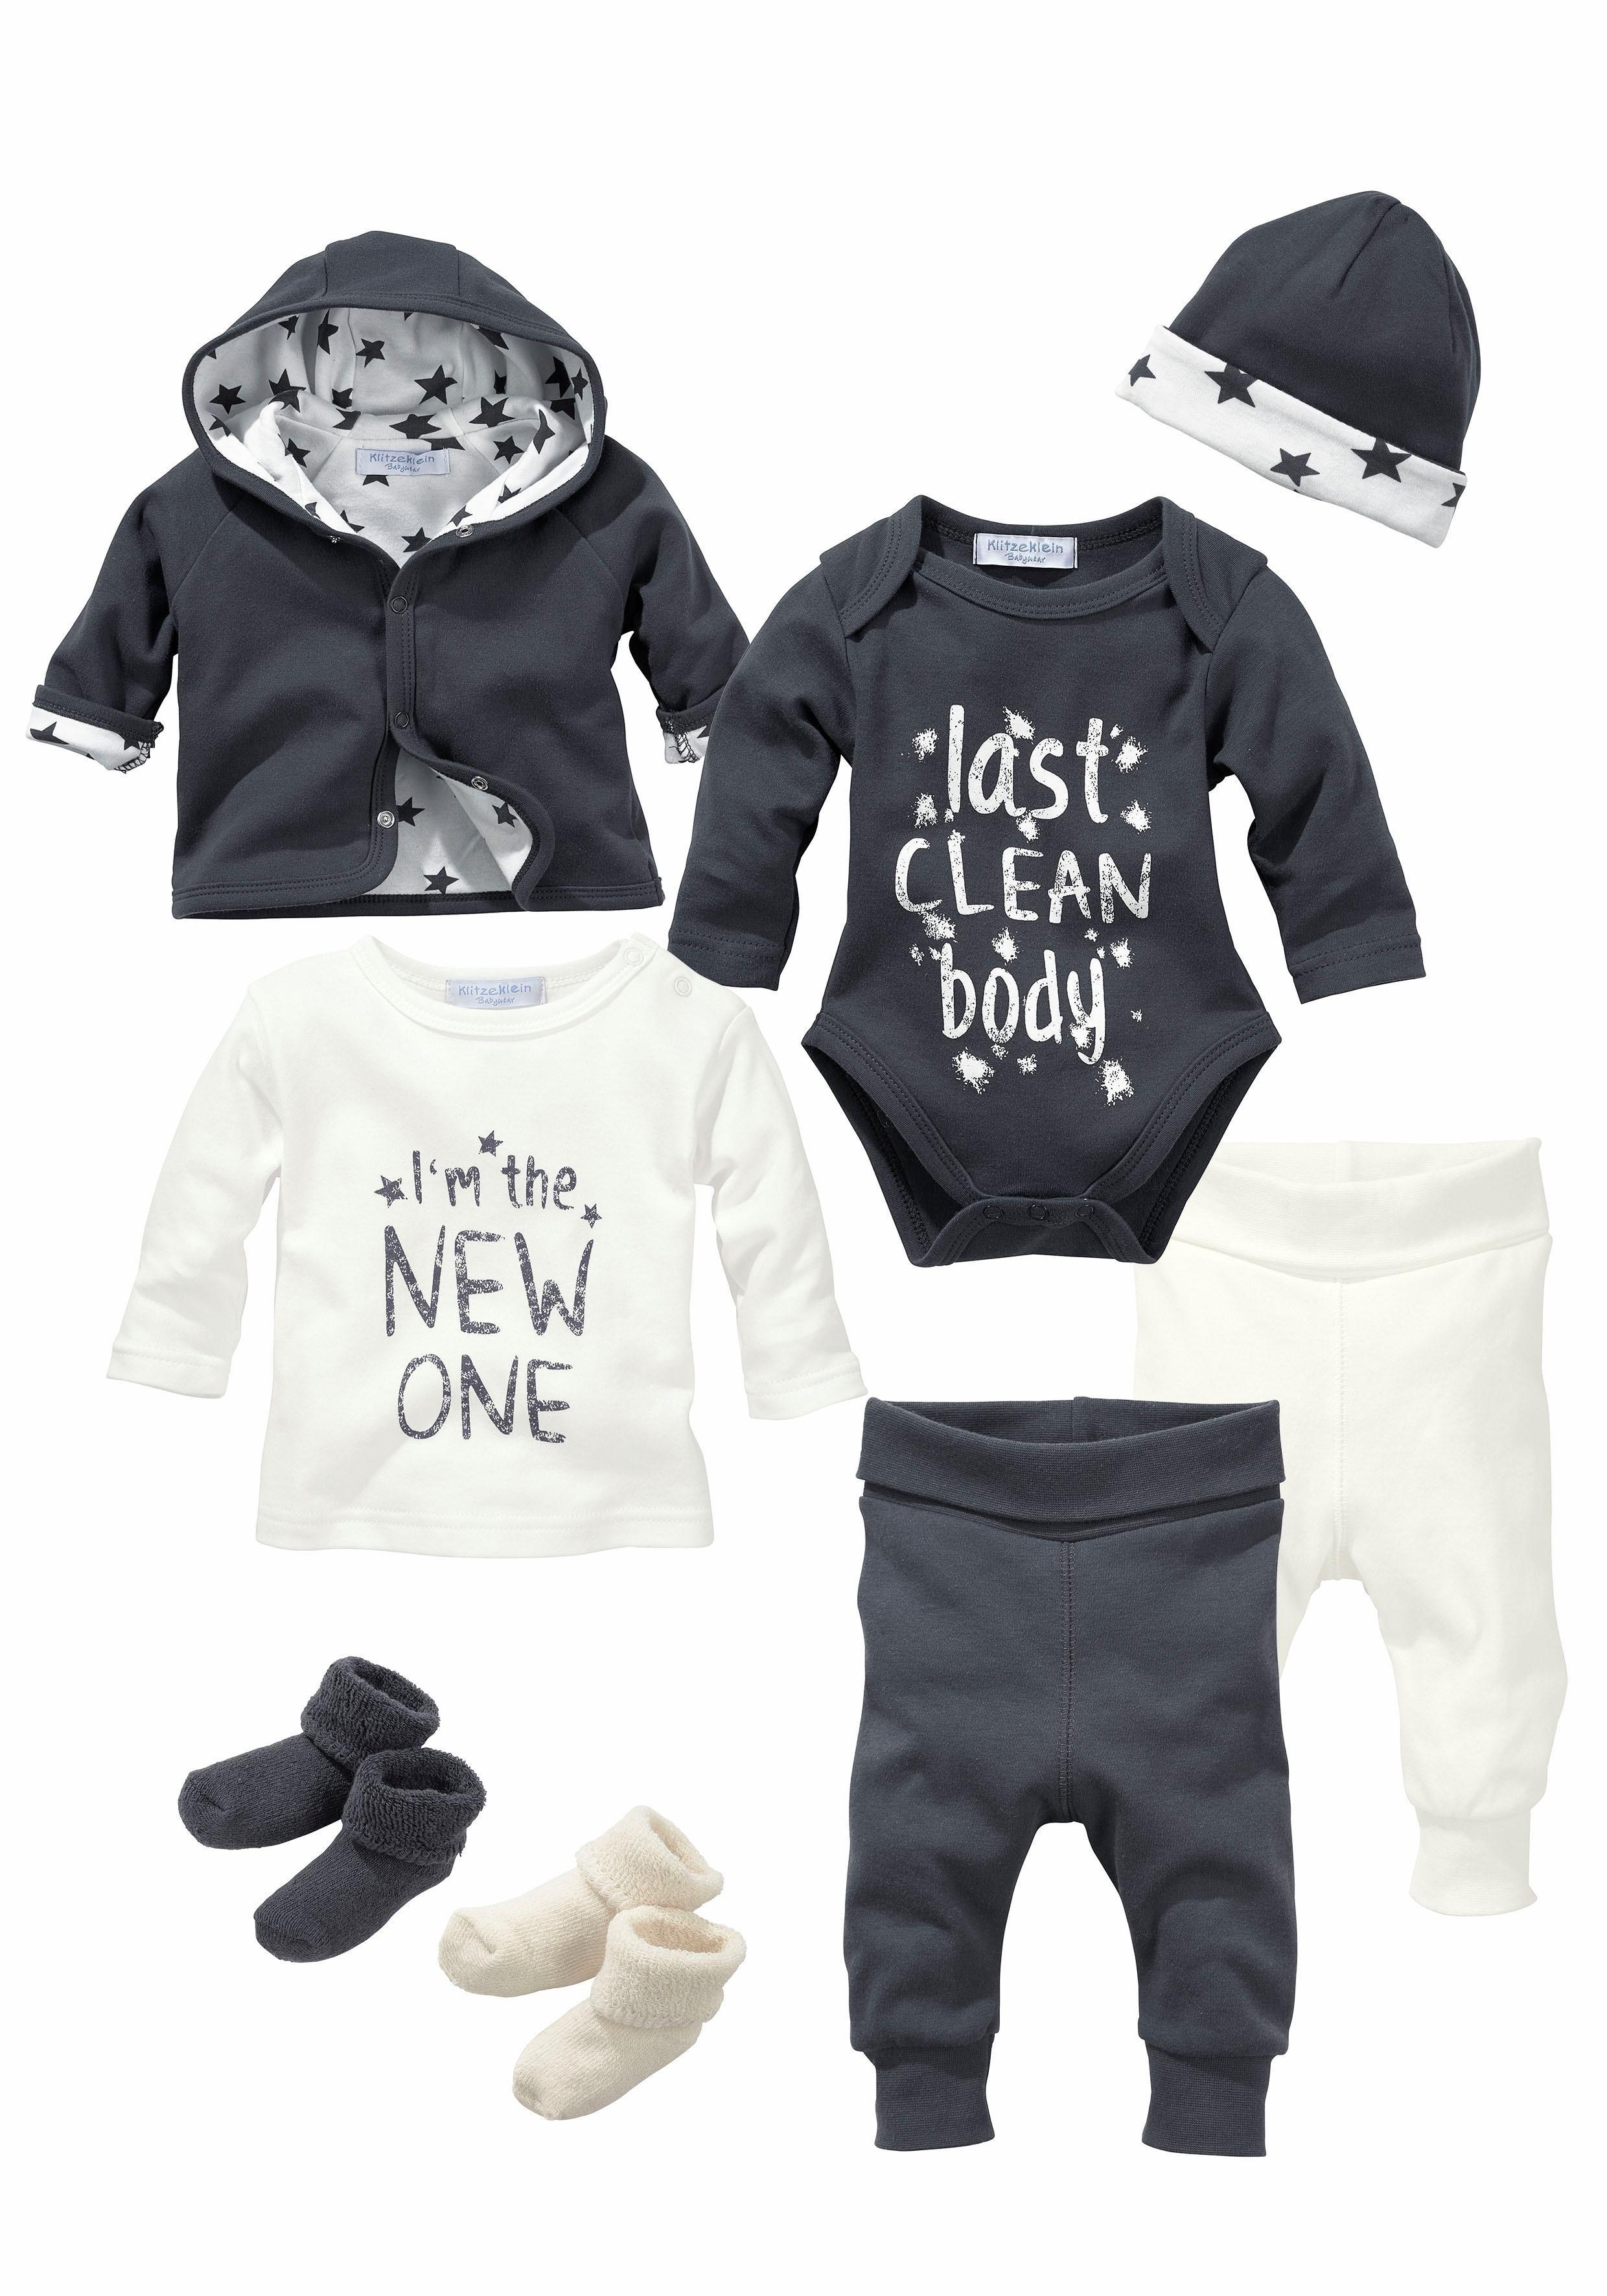 Babykleding Setjes.Babysetjes Online Shop Nu Online Kopen Otto